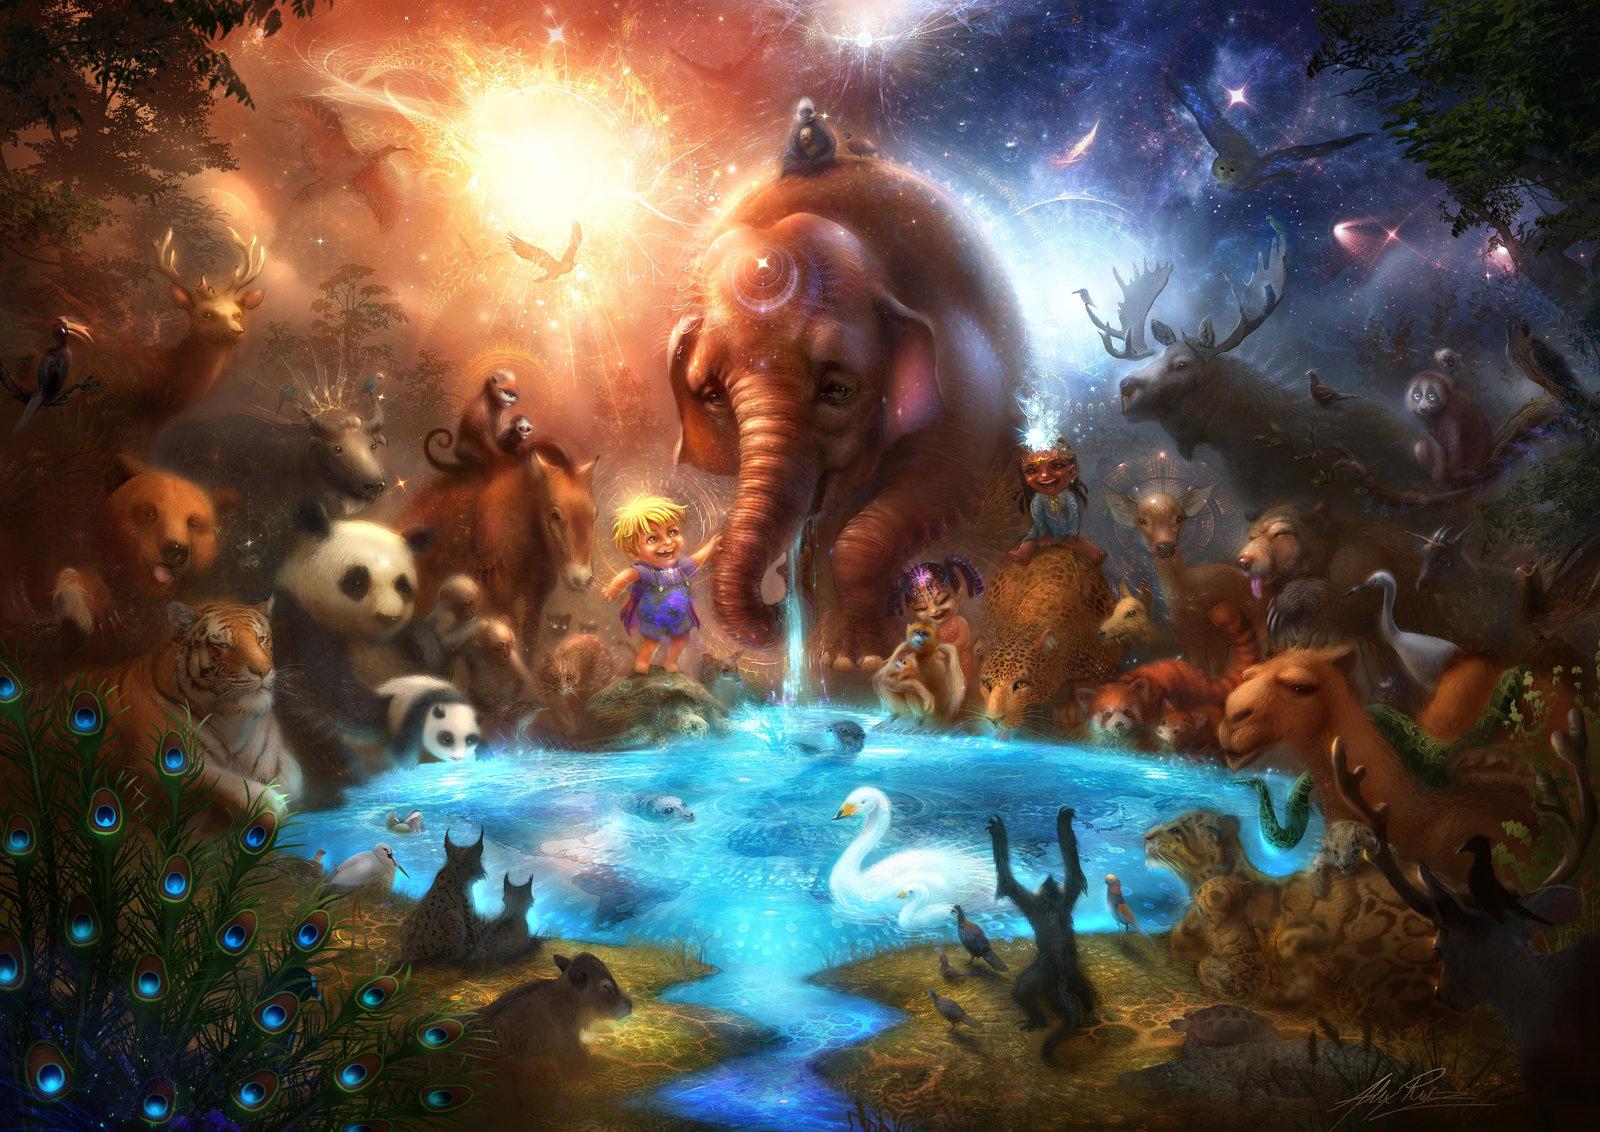 http://cp16.nevsepic.com.ua/269/26886/1462295567-tarrzan-thirst-for-life-2011.jpg